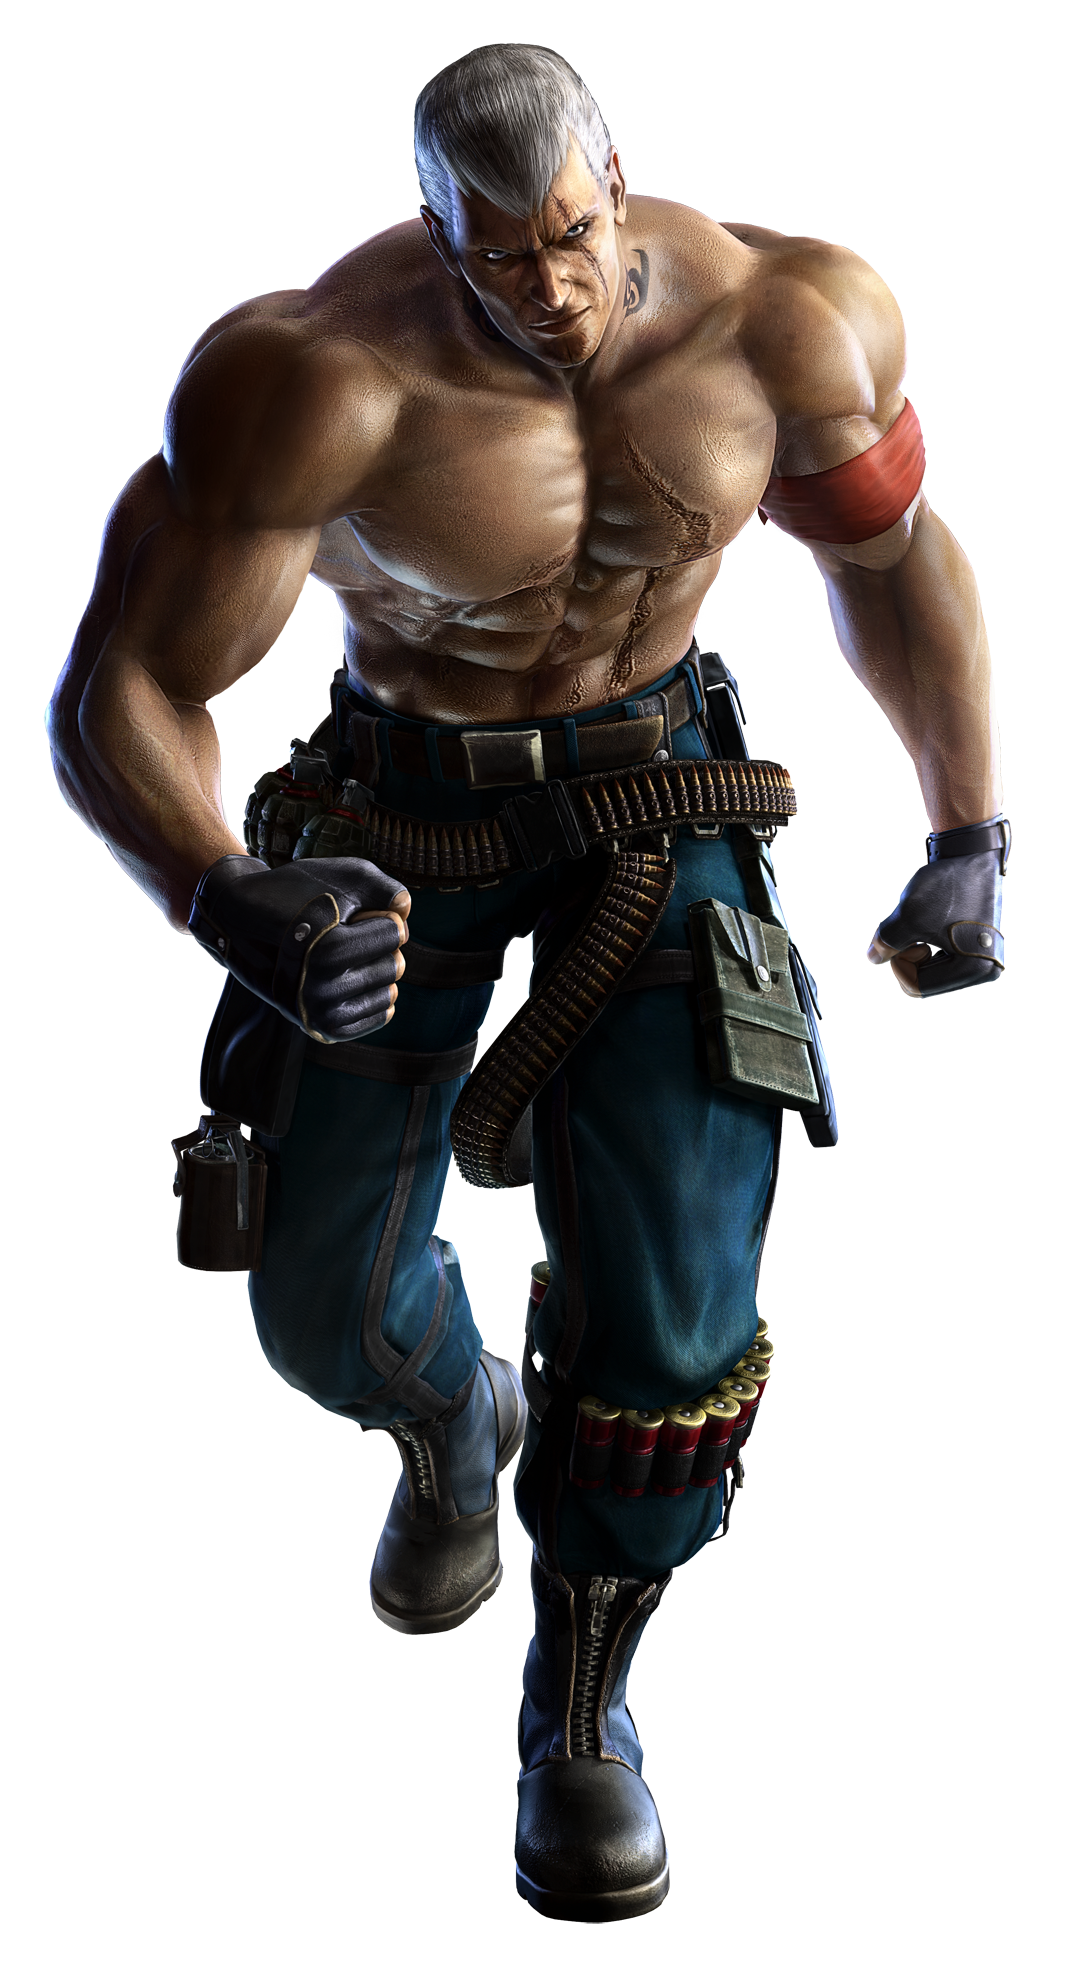 Tekken Bryan Fury Strategywiki The Video Game Walkthrough And Strategy Guide Wiki